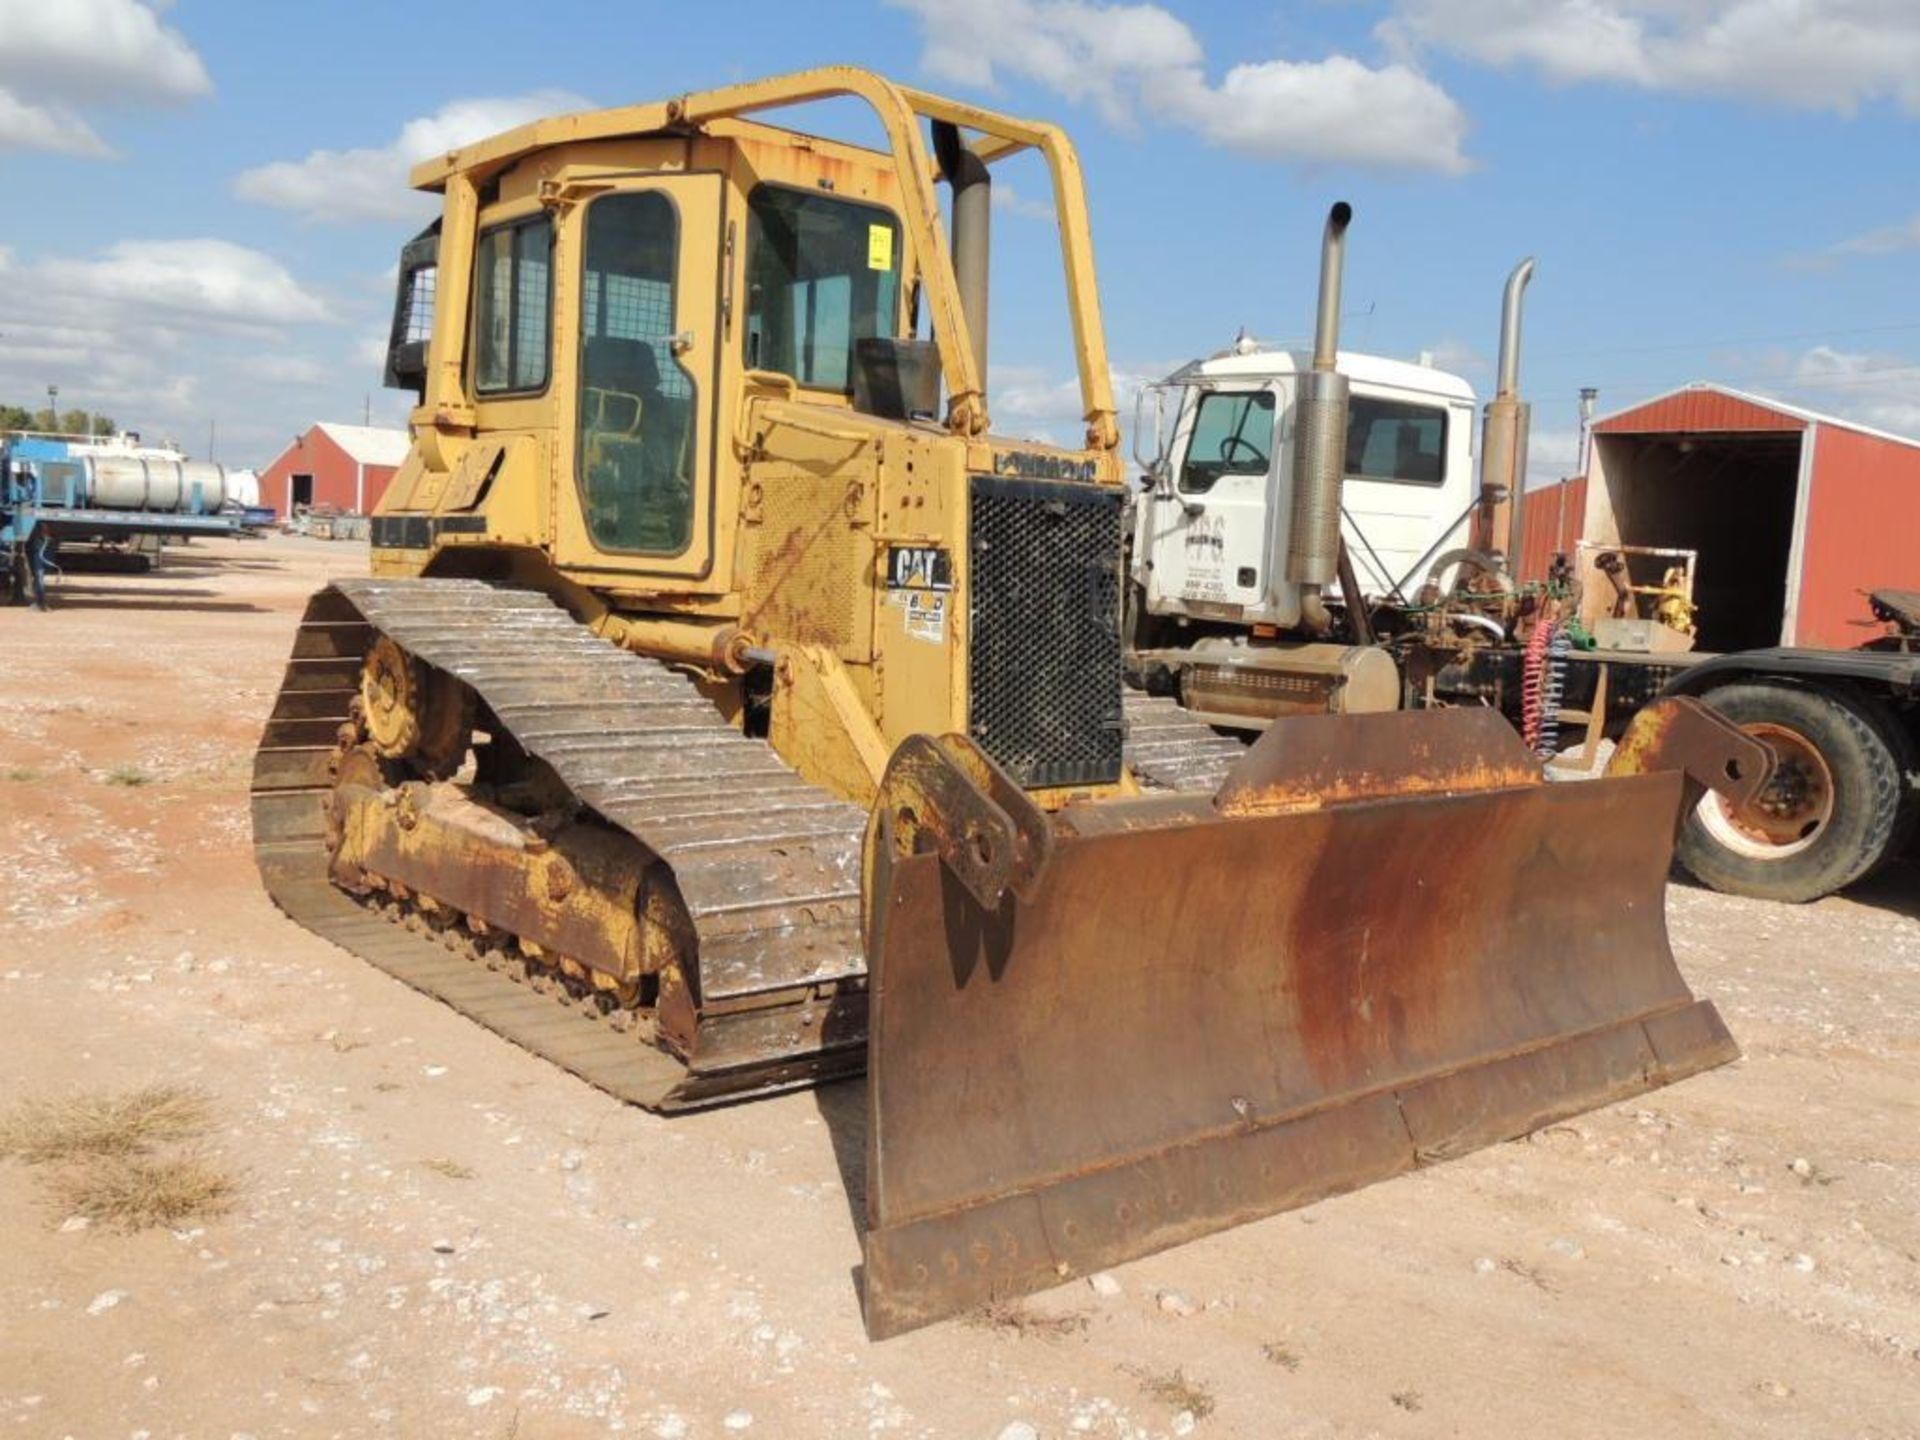 1996 Caterpillar D4H-LGP Series III Crawler Tractor, 6 Way Blade, 30 In. Grousers, 7570 Hrs. - Image 2 of 4